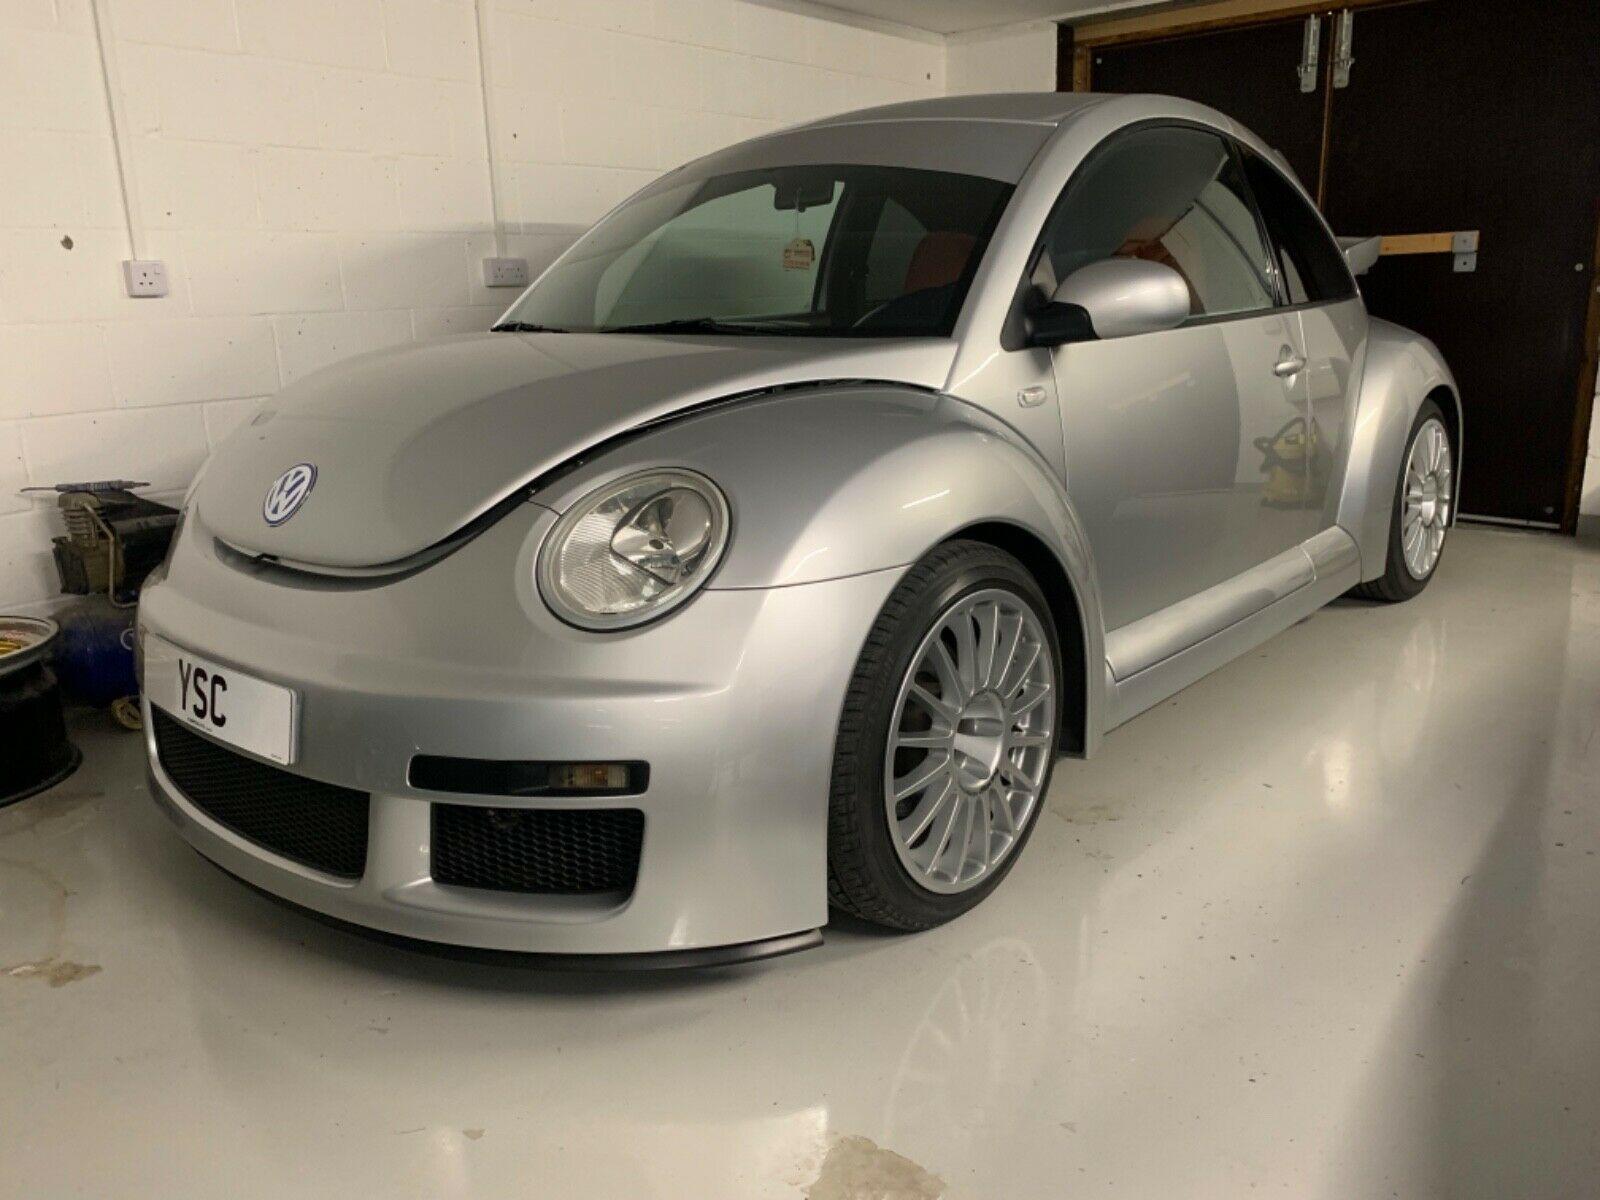 Volkswagen-Beetle-RSi-for-sale-3